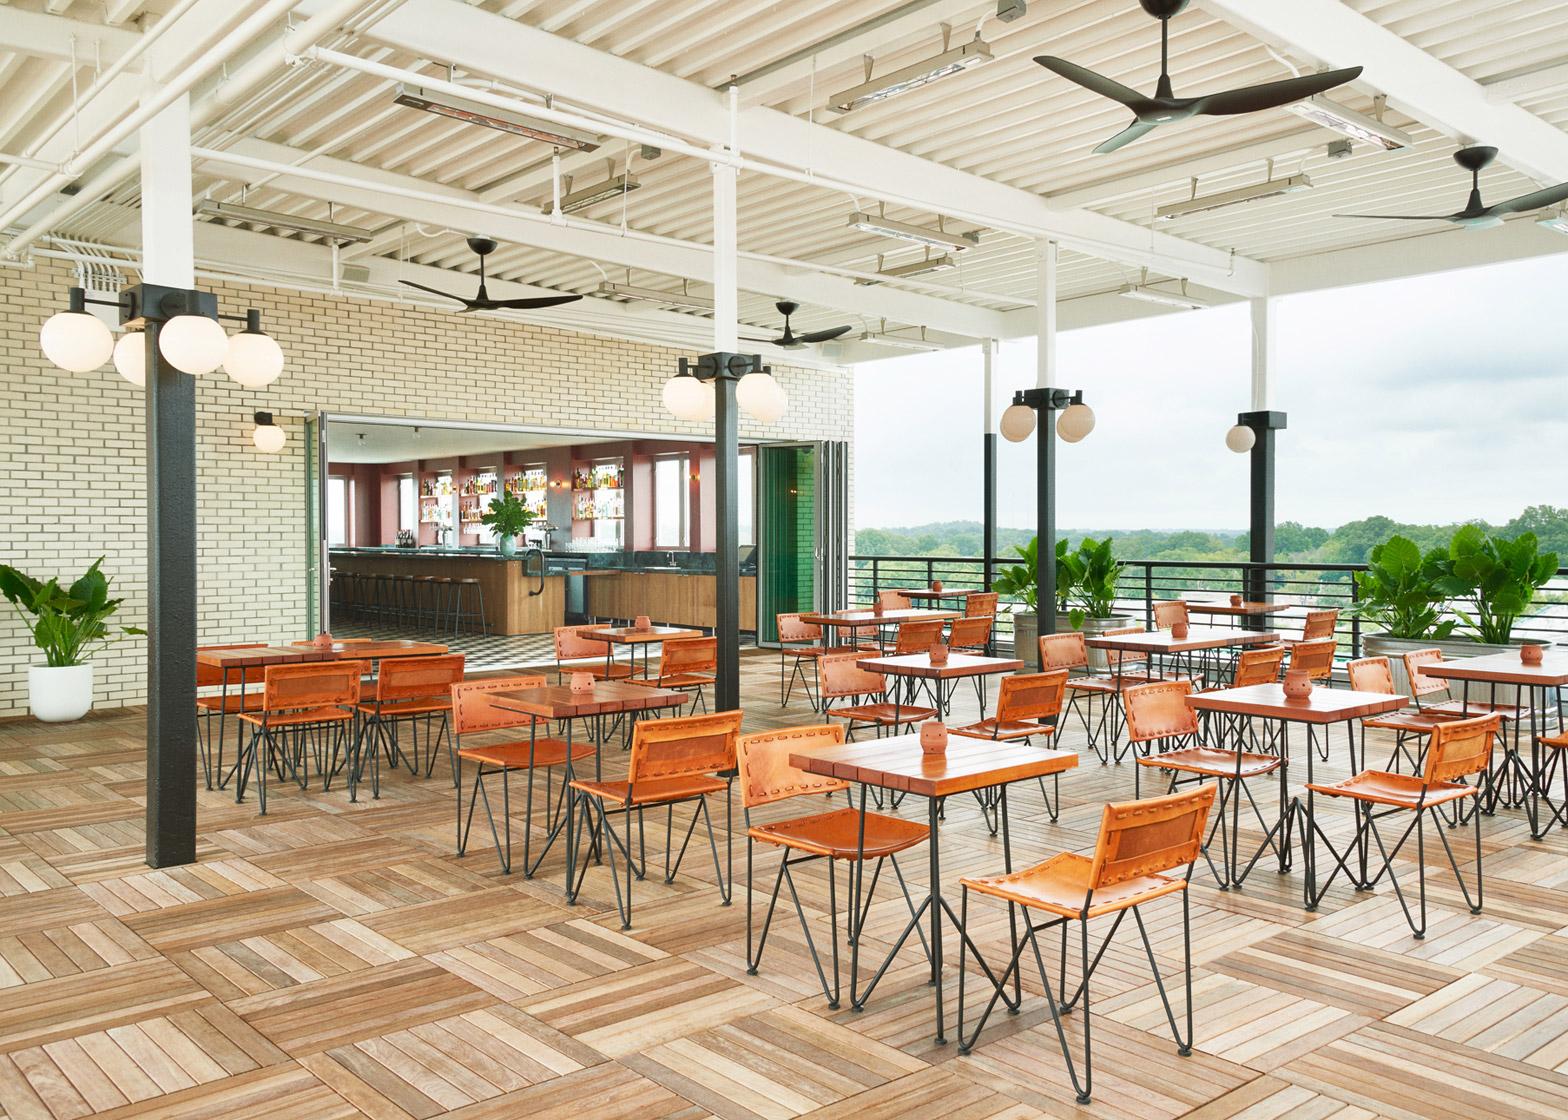 North-Carolina-hotel_The-Durham_Commune_Mutual-Savings-Bank-conversion_dezeen_1568_4